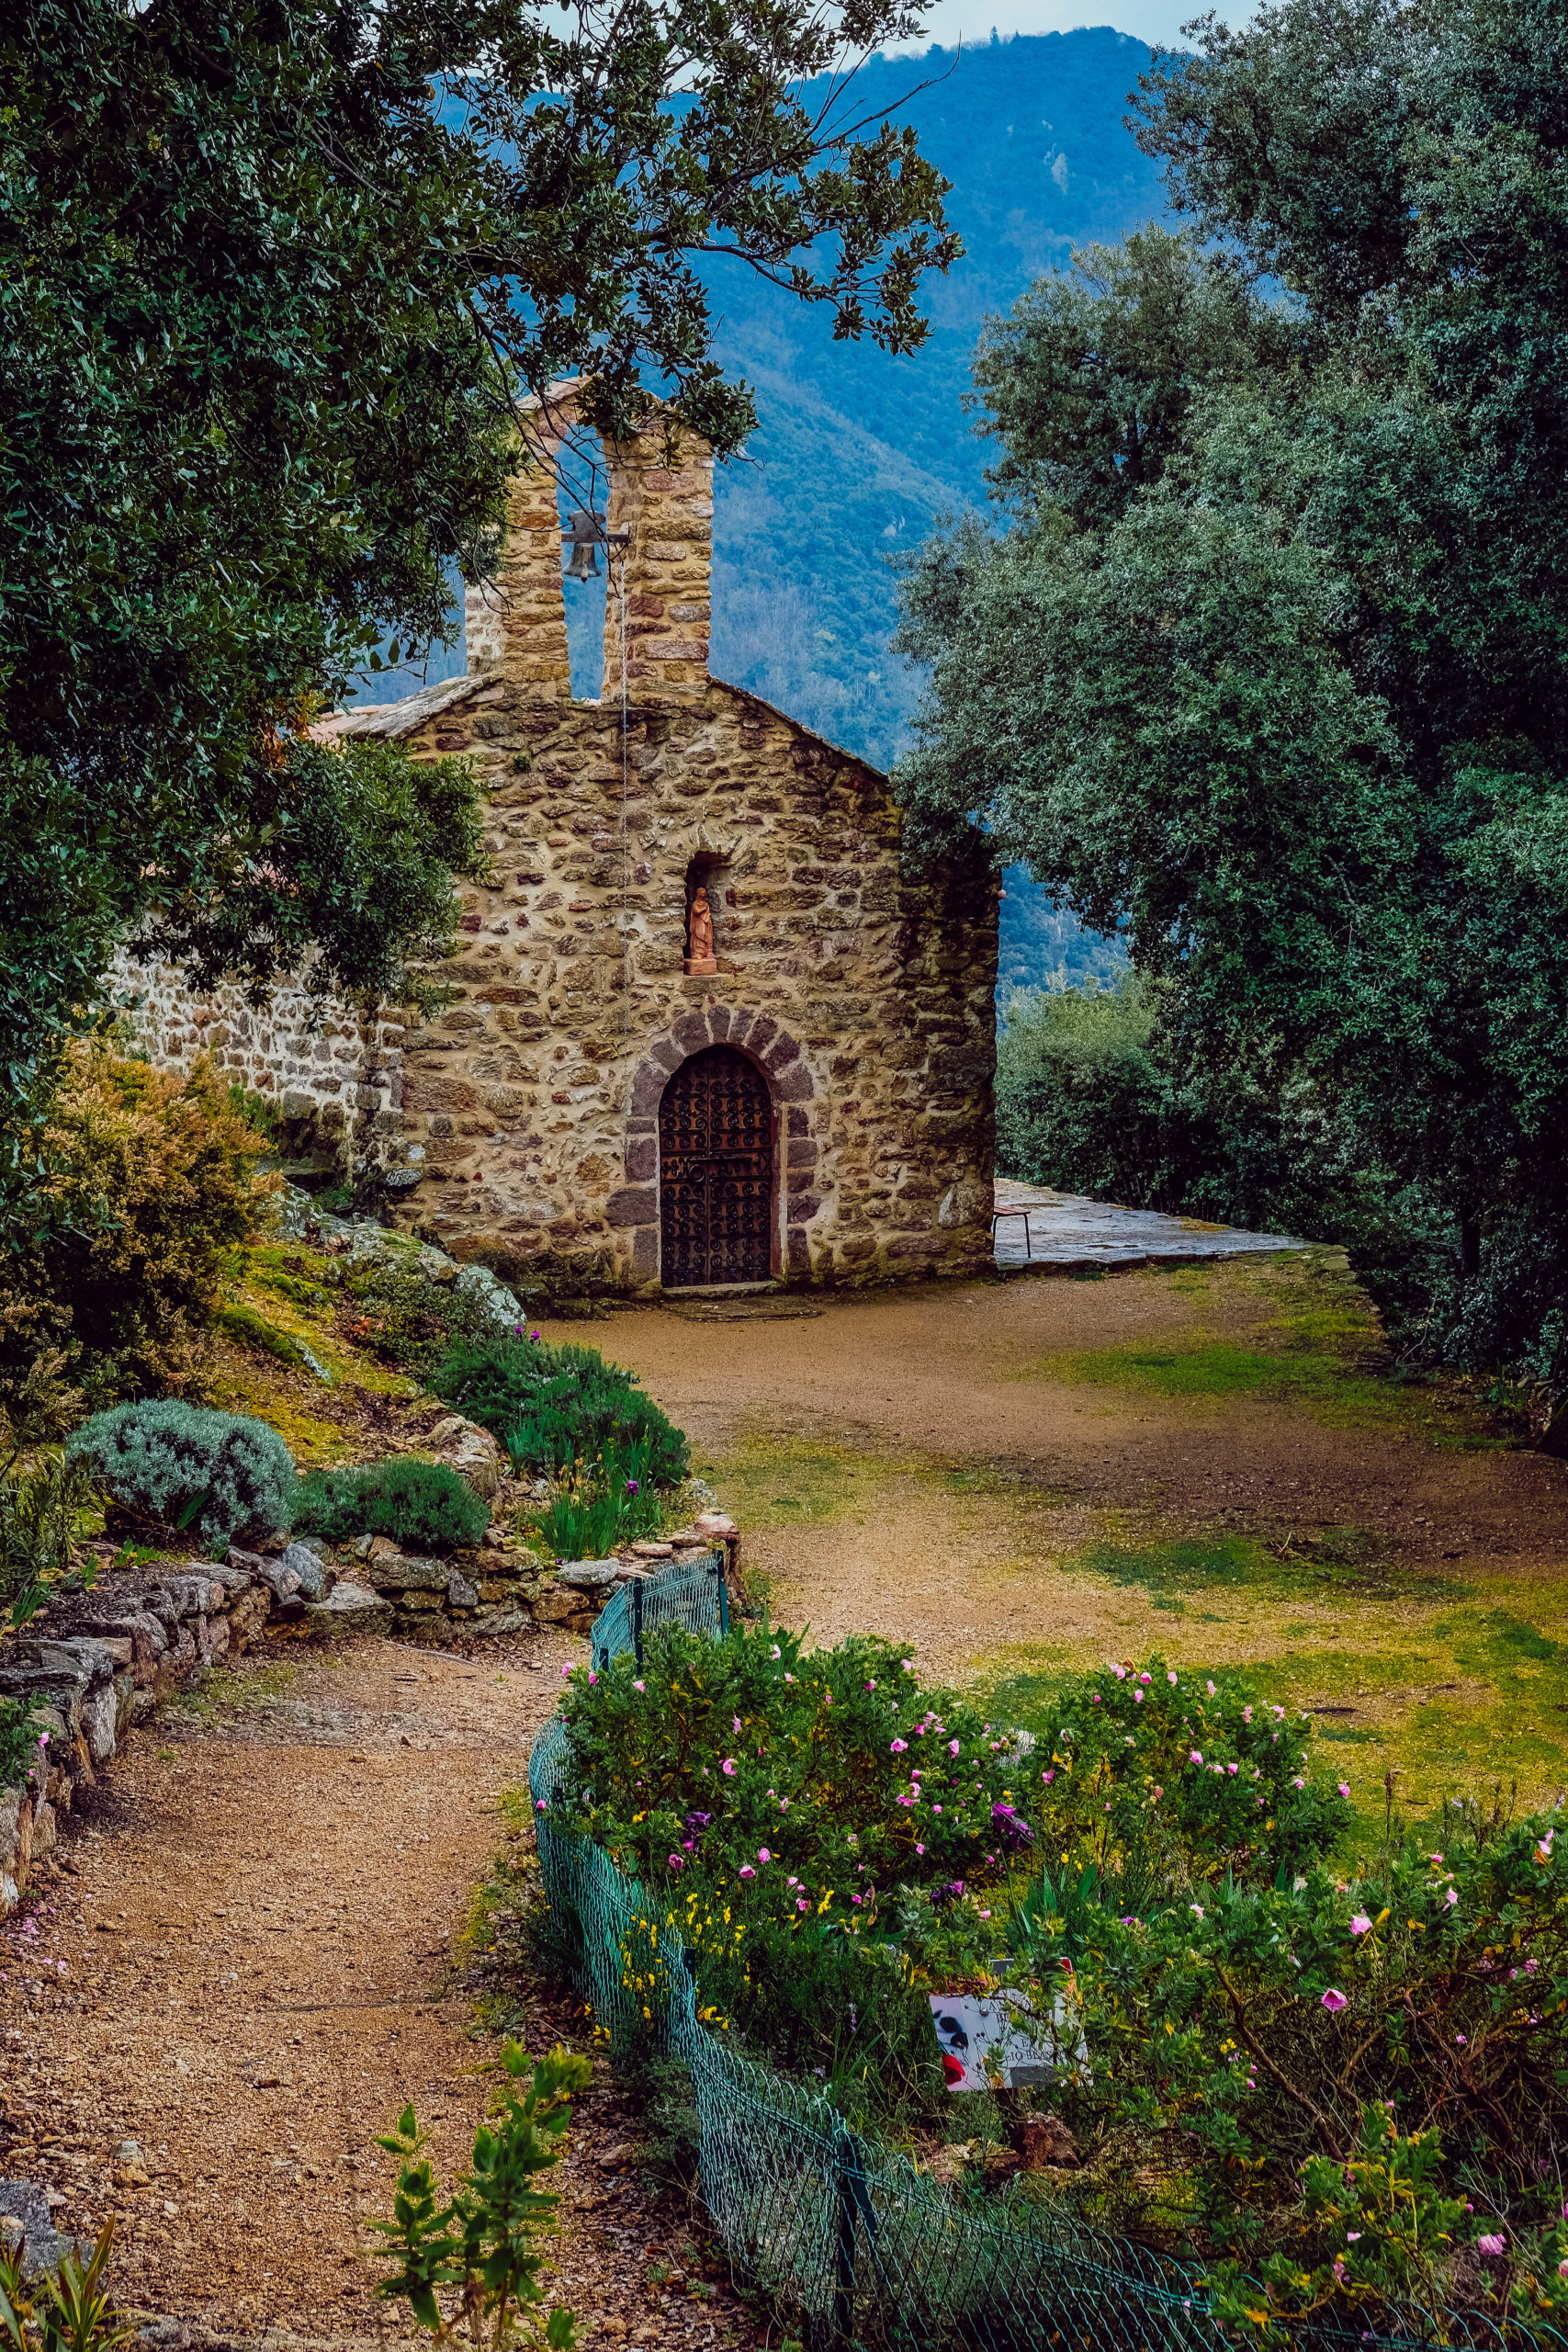 Découverte de La Chapelle Santa Engracia